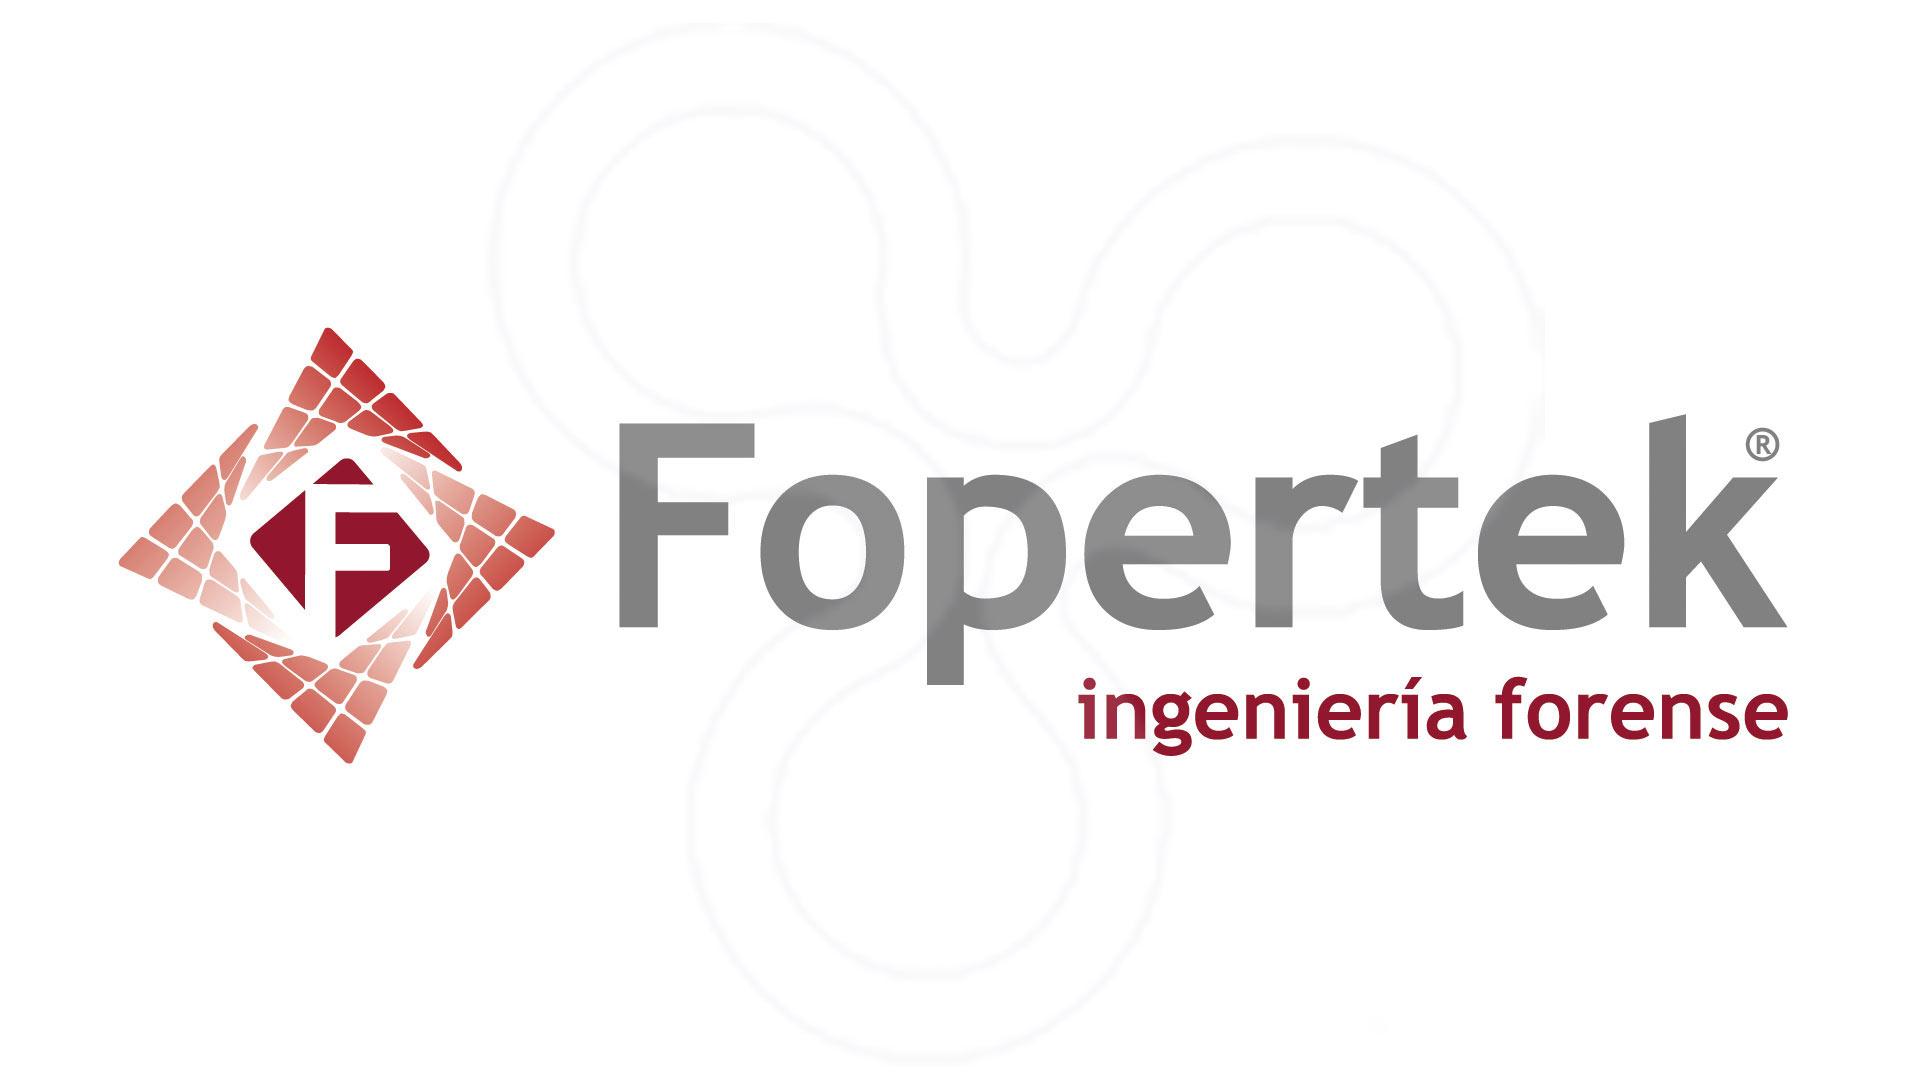 Identidad corporativa para FOPERTEK